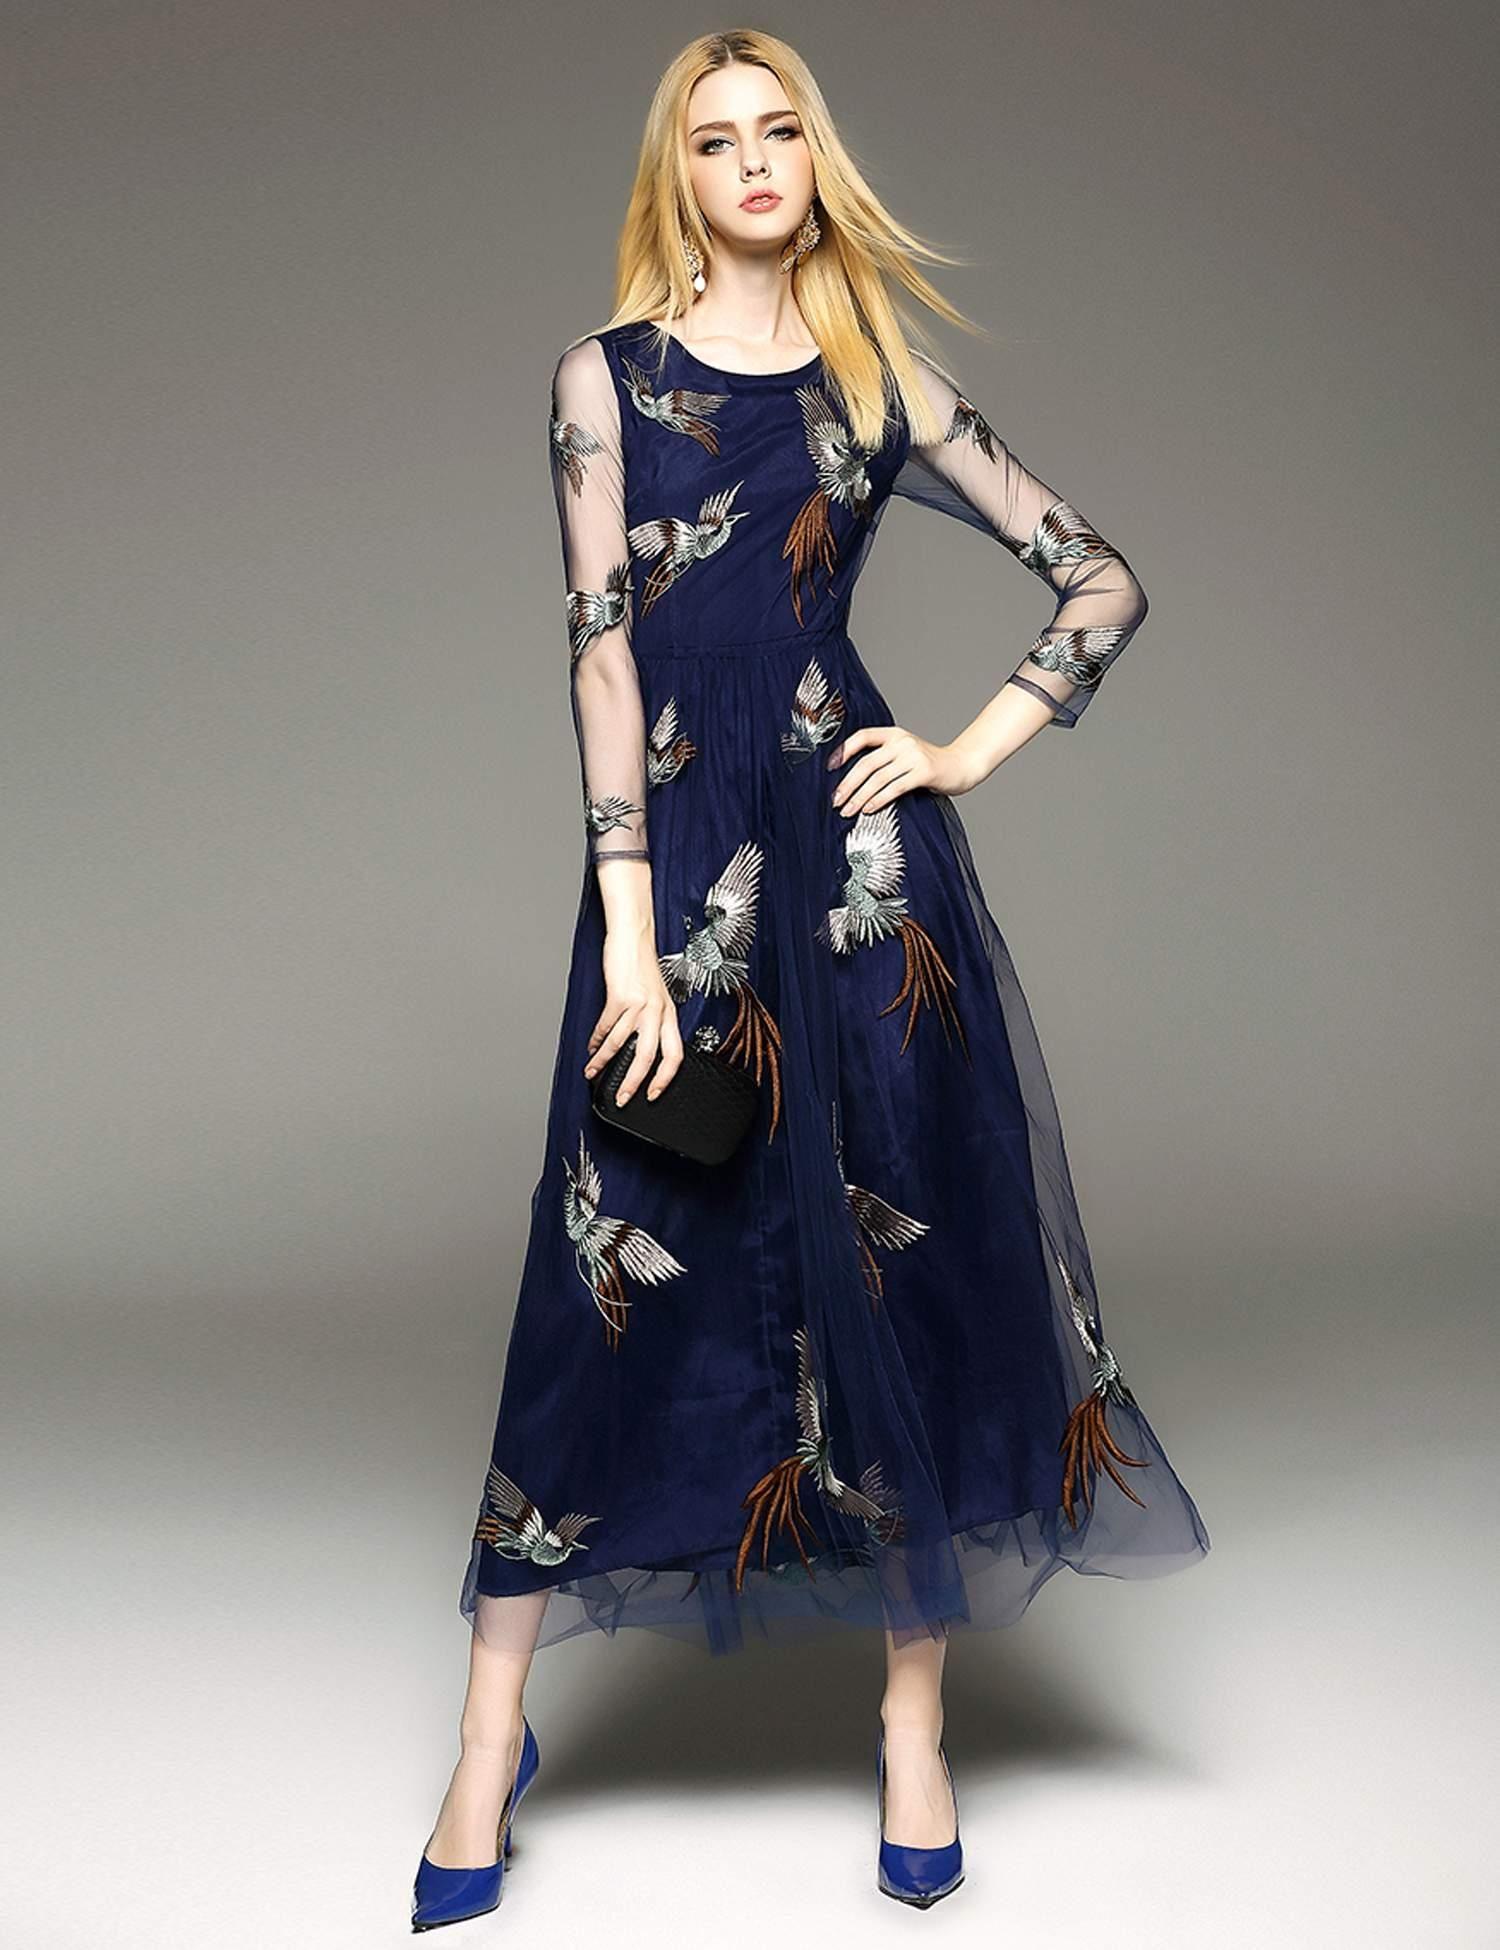 Elenyun round sheer long dress fashion illustrations pinterest